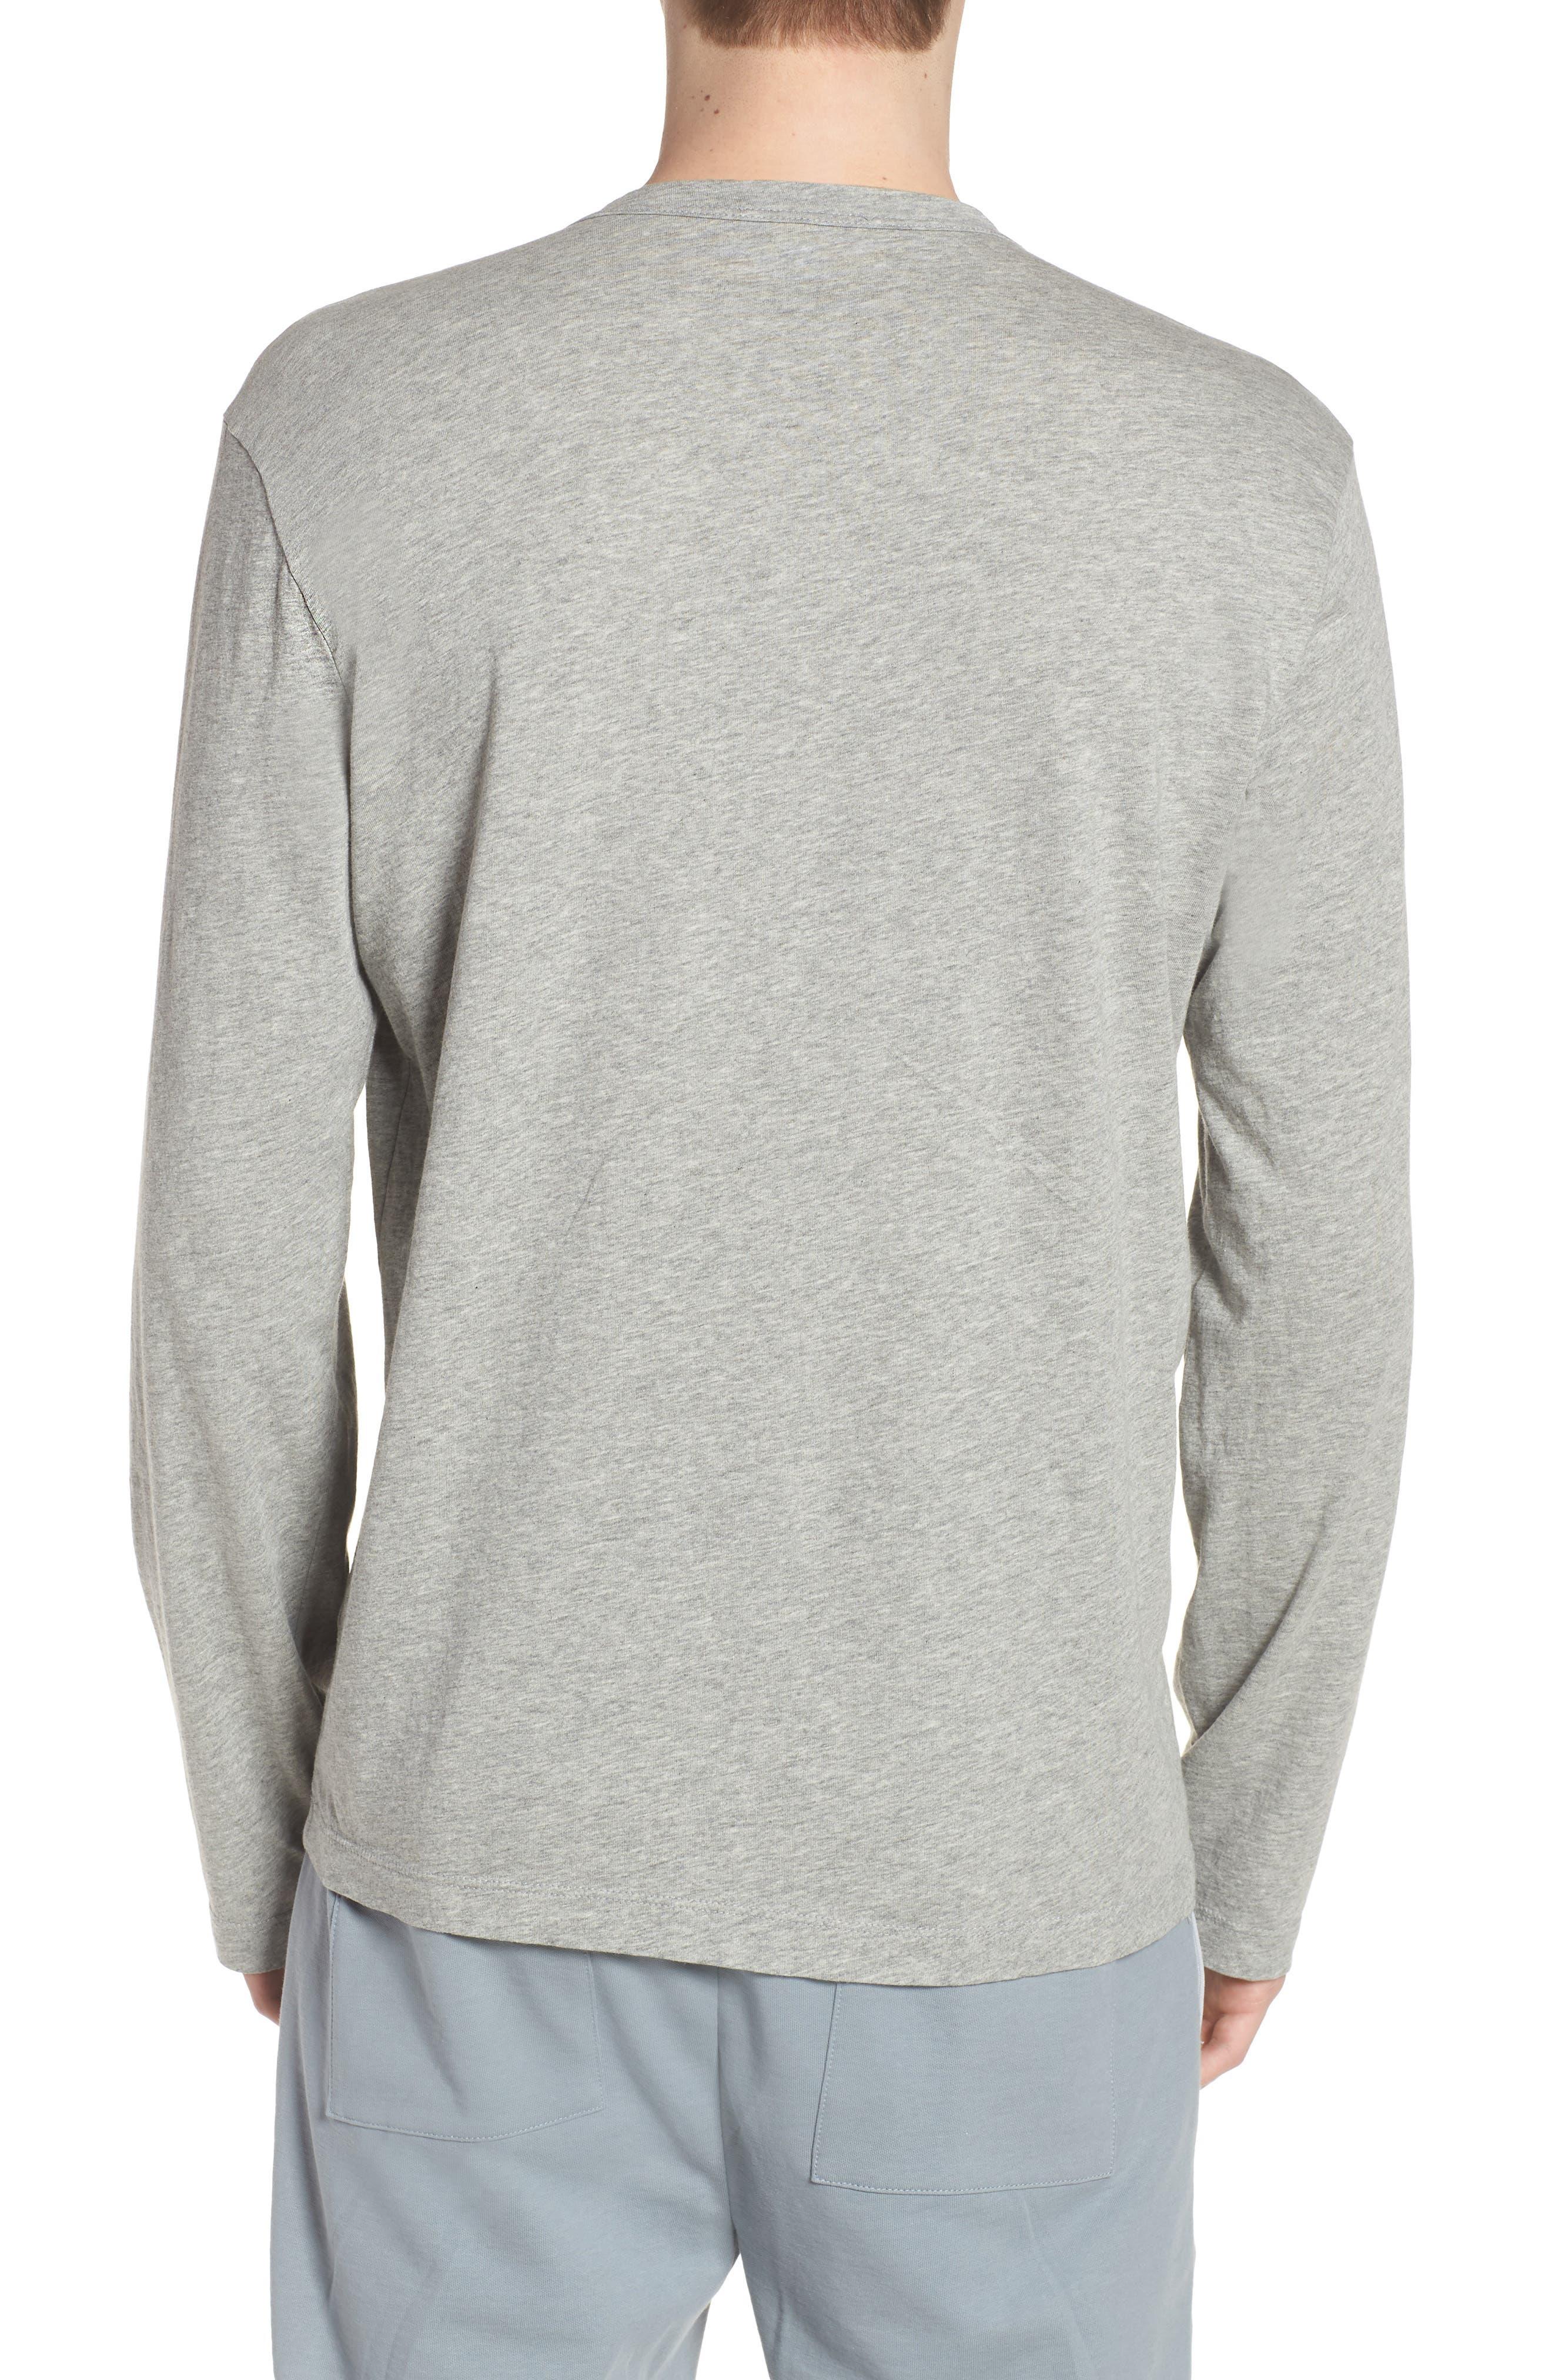 Alternate Image 2  - James Perse Crewneck Cotton Sweatshirt